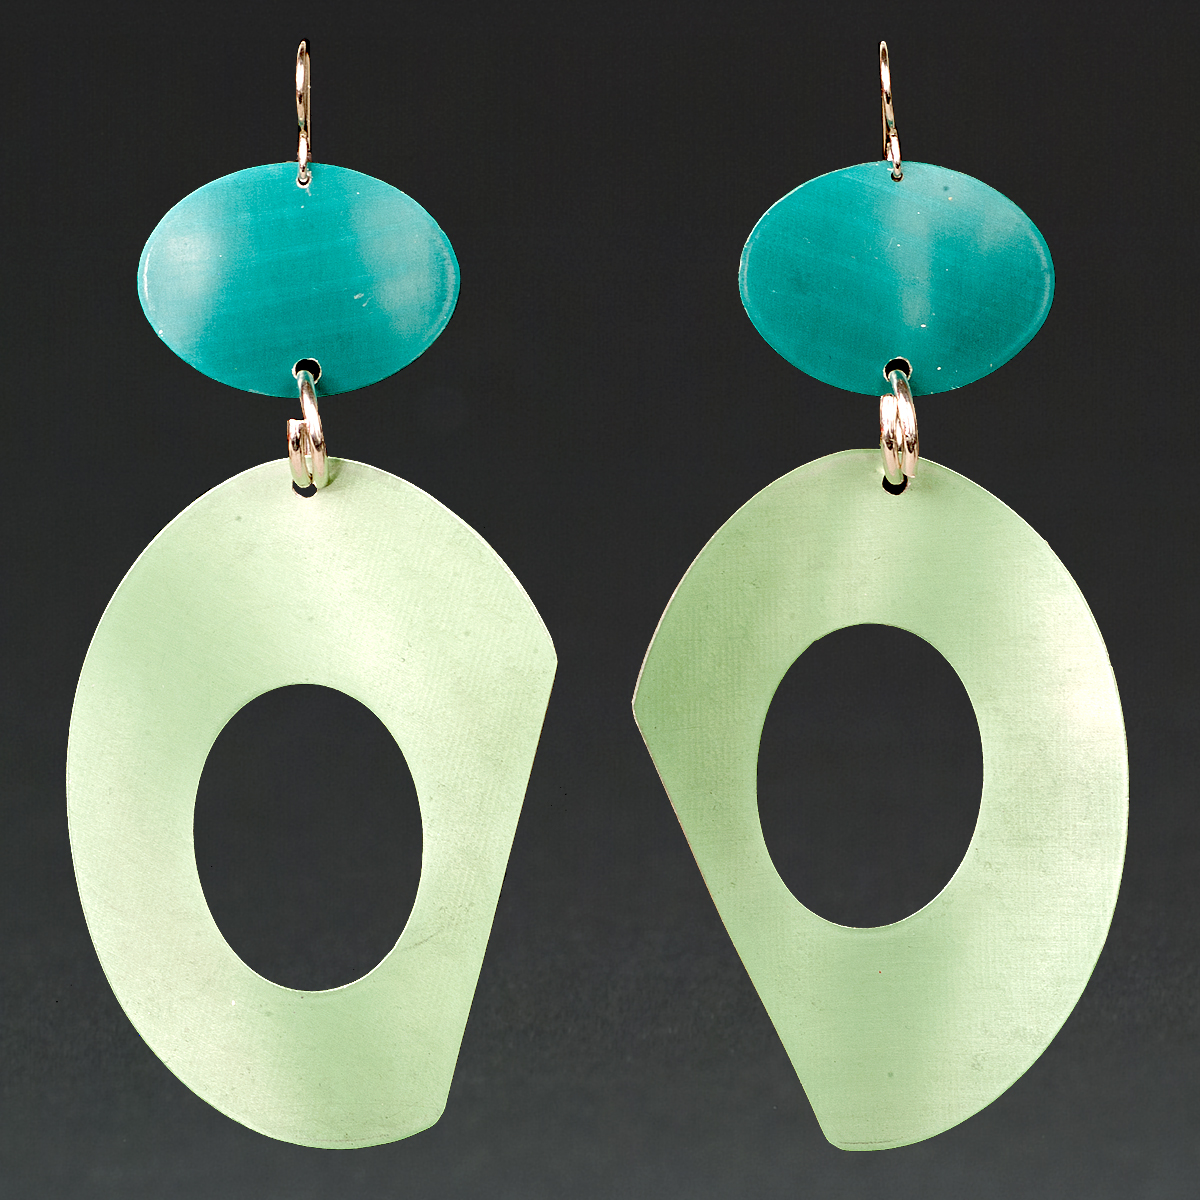 B - Turquoise, Chablis